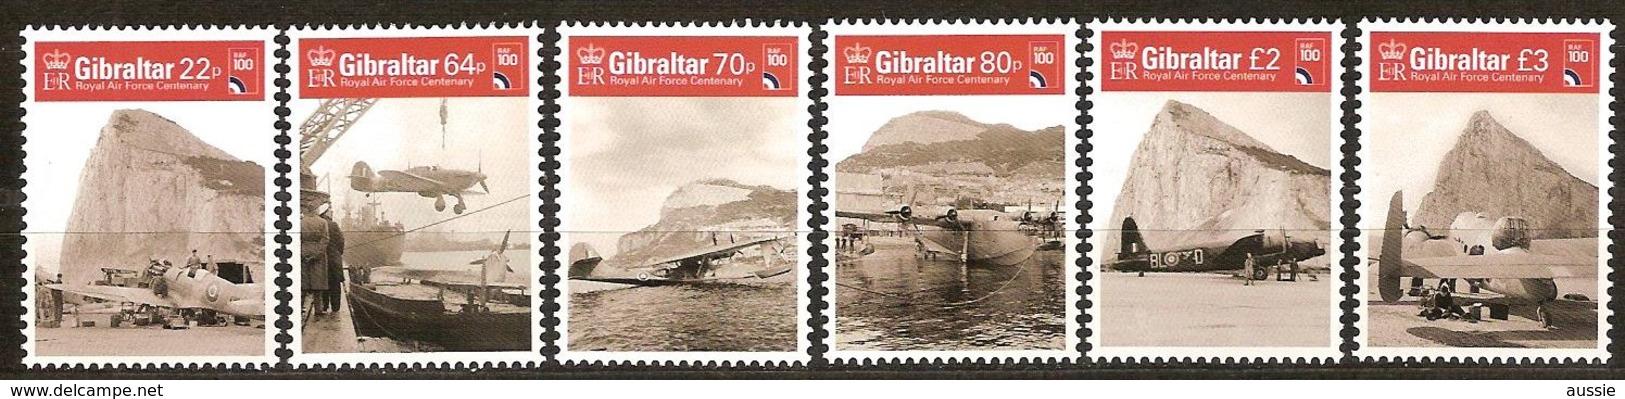 Gibraltar 2018 Micheln° 1858-1863 *** MNH  Royal Air Force Avions Airplanes Vliegtuigen - Gibraltar